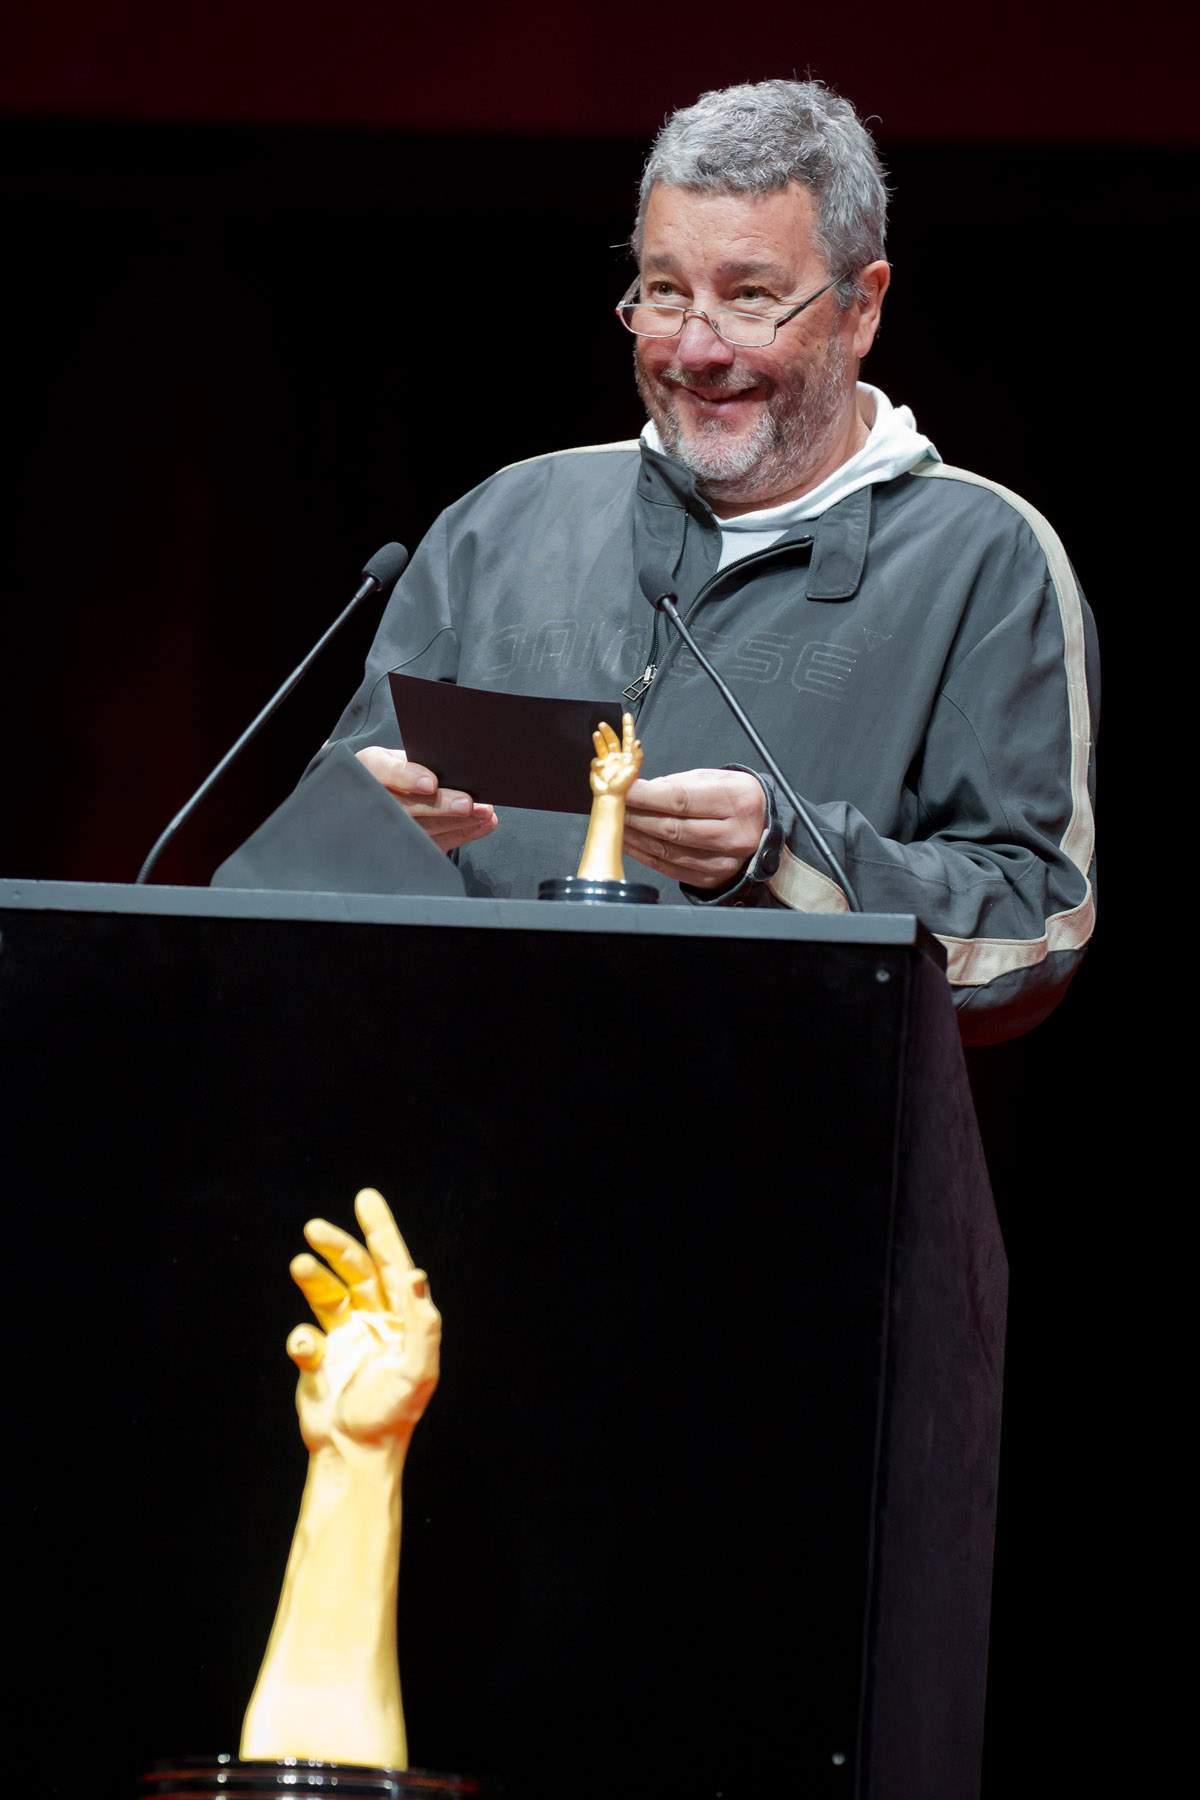 Philippe Starck (jury member of the GPHG 2013)